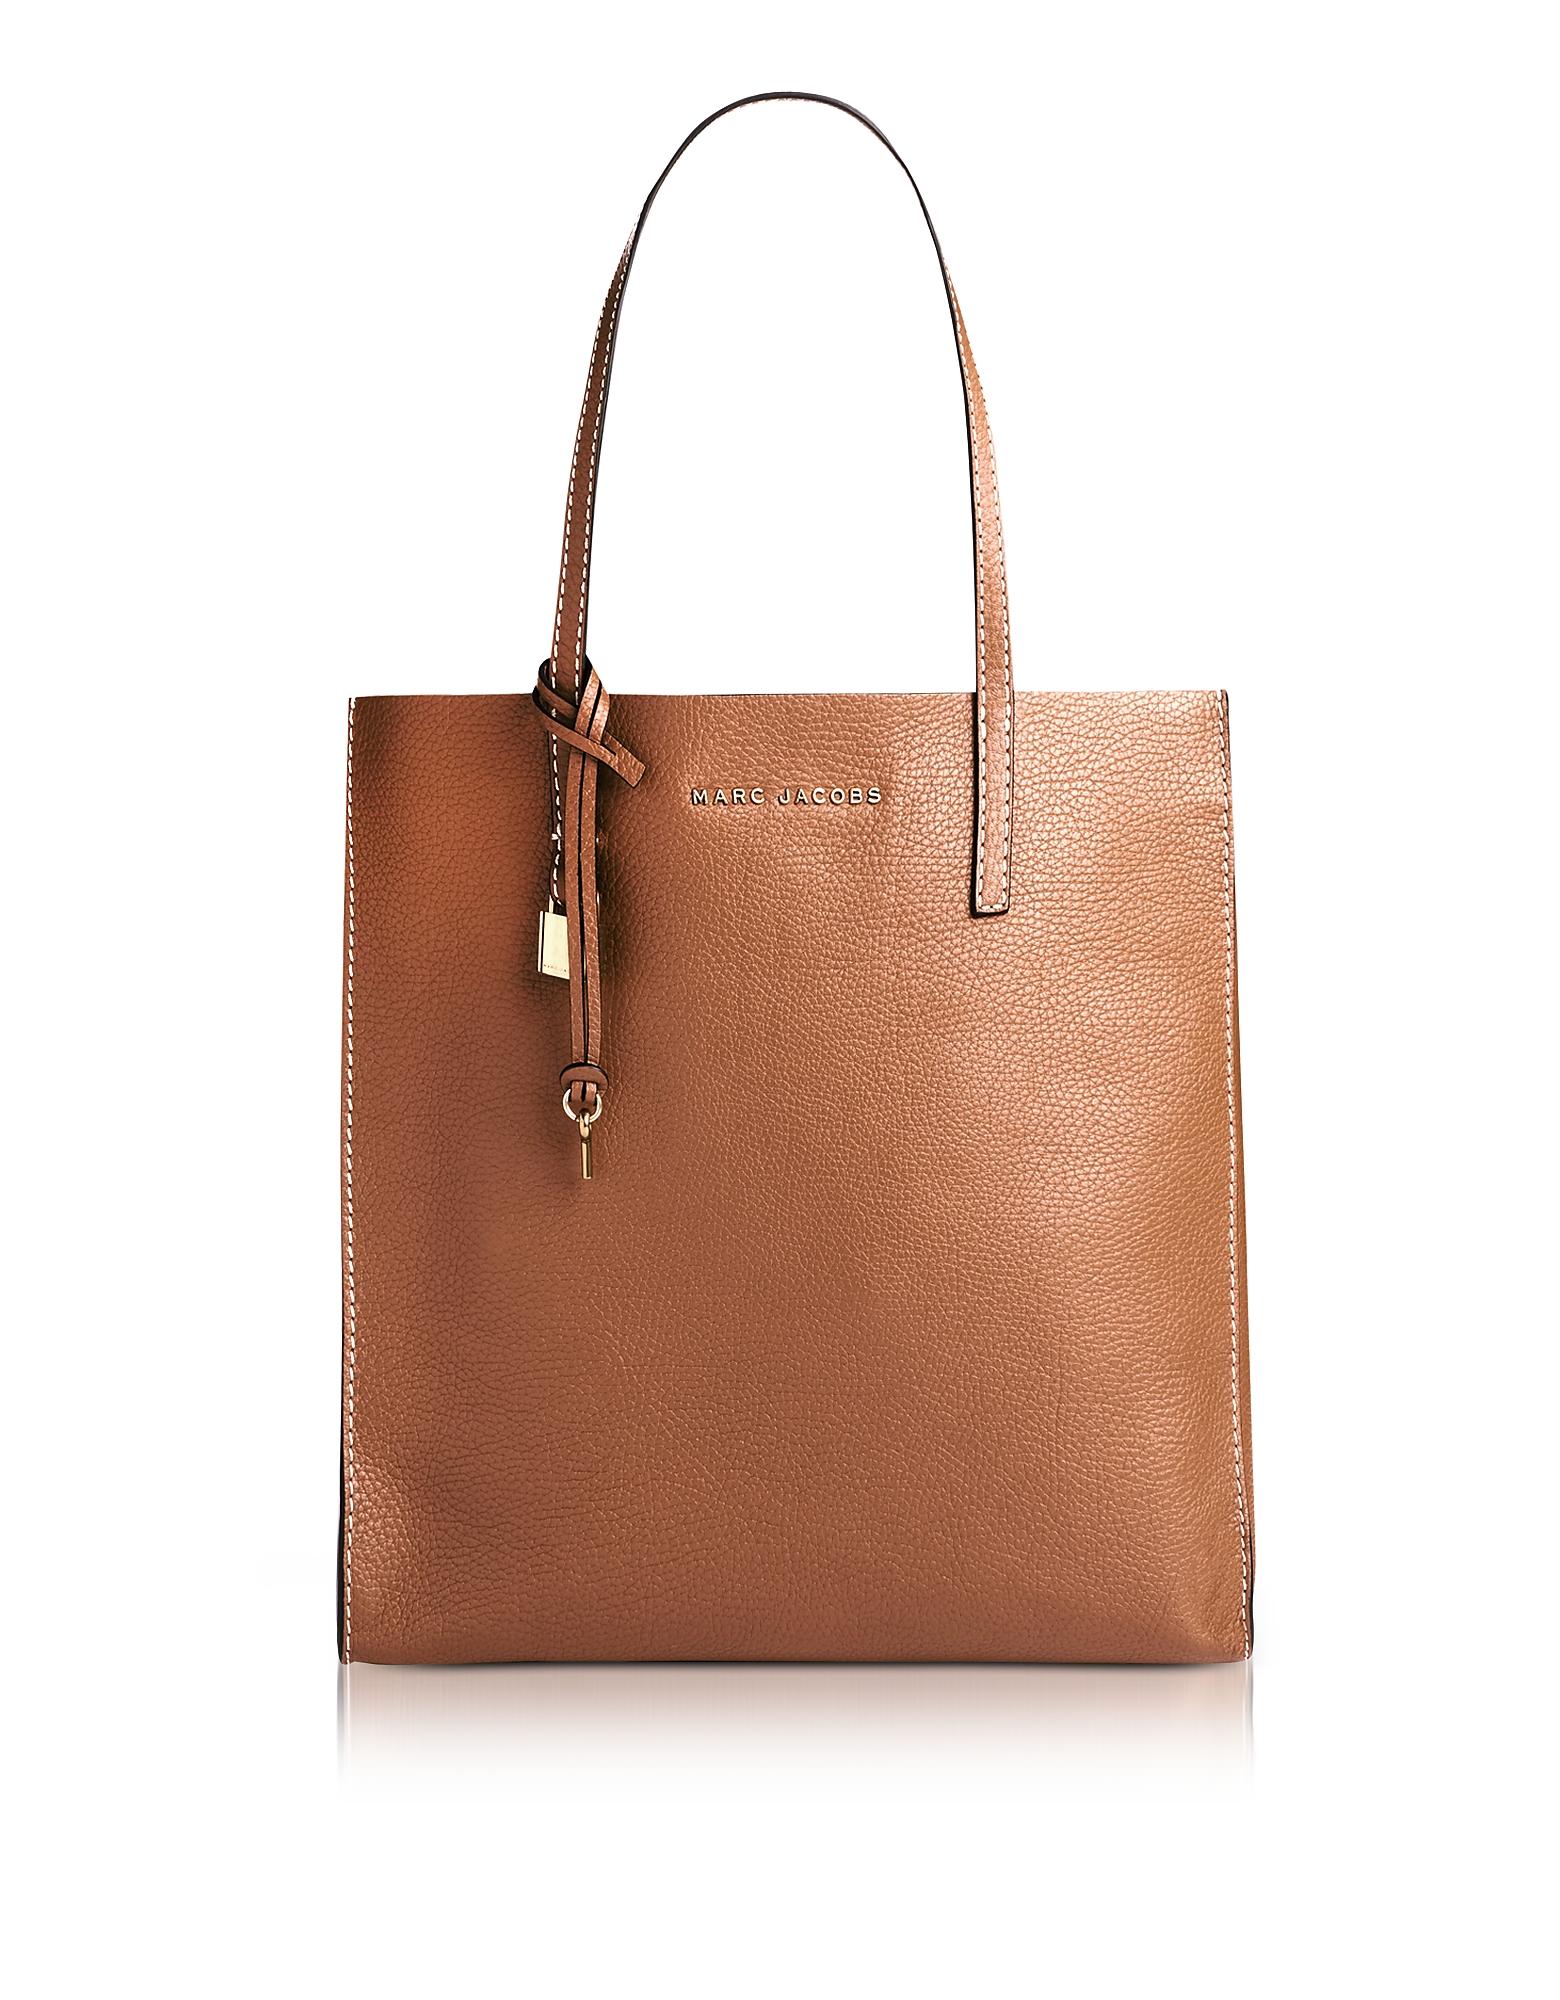 Marc Jacobs Handbags, Saddle Leather The Grind Shopper Tote Bag